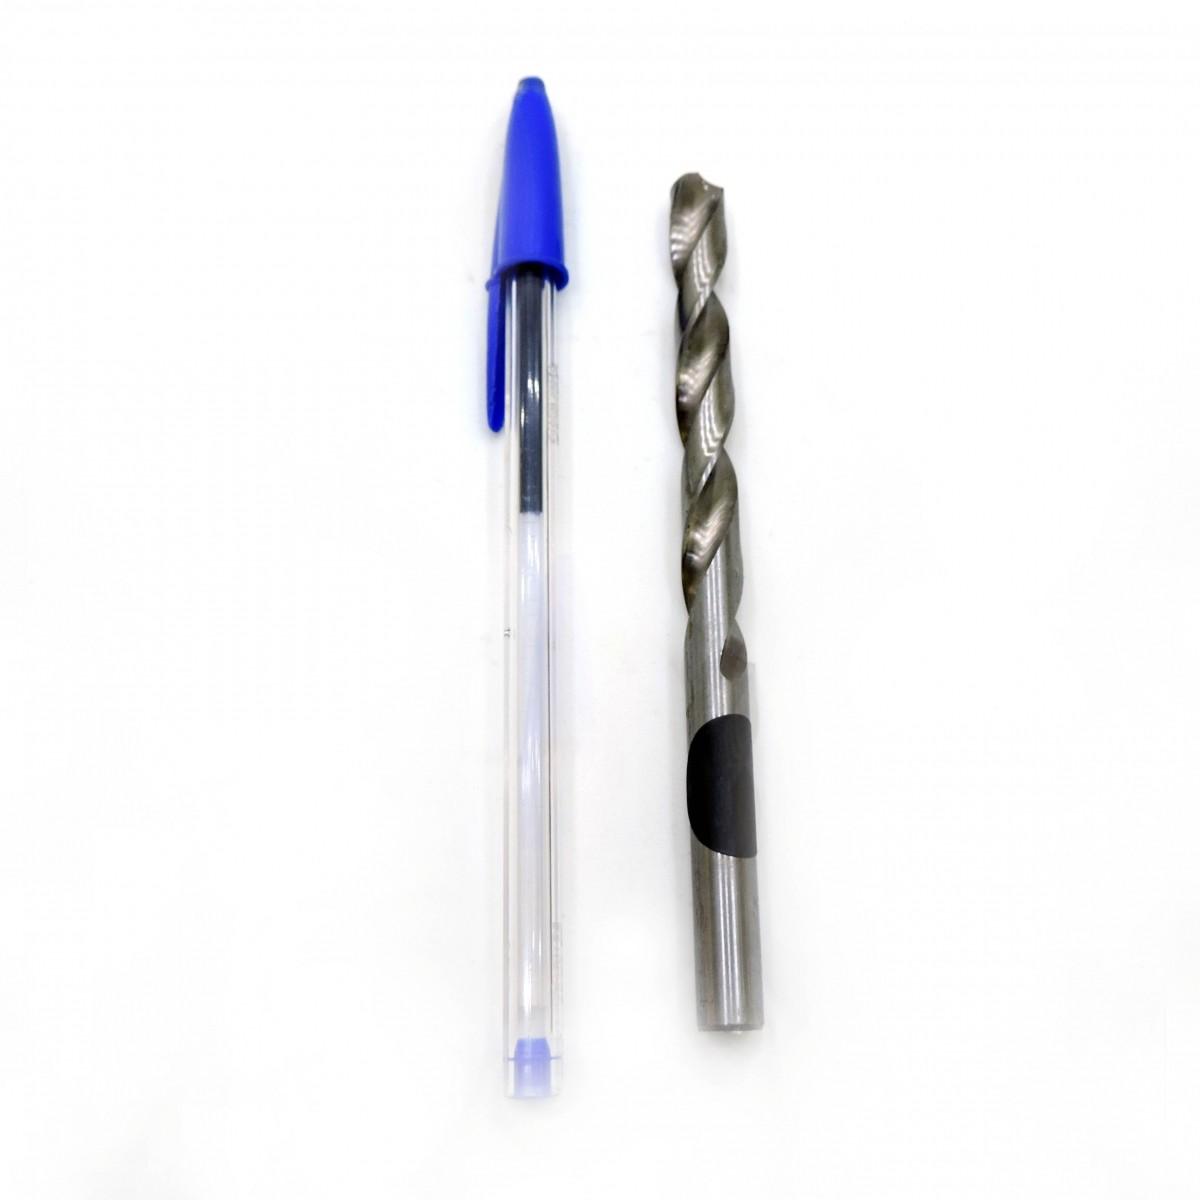 Broca Helicoidal Cilíndrica Mota - Hss 8,75mm Din 338 - Bh13